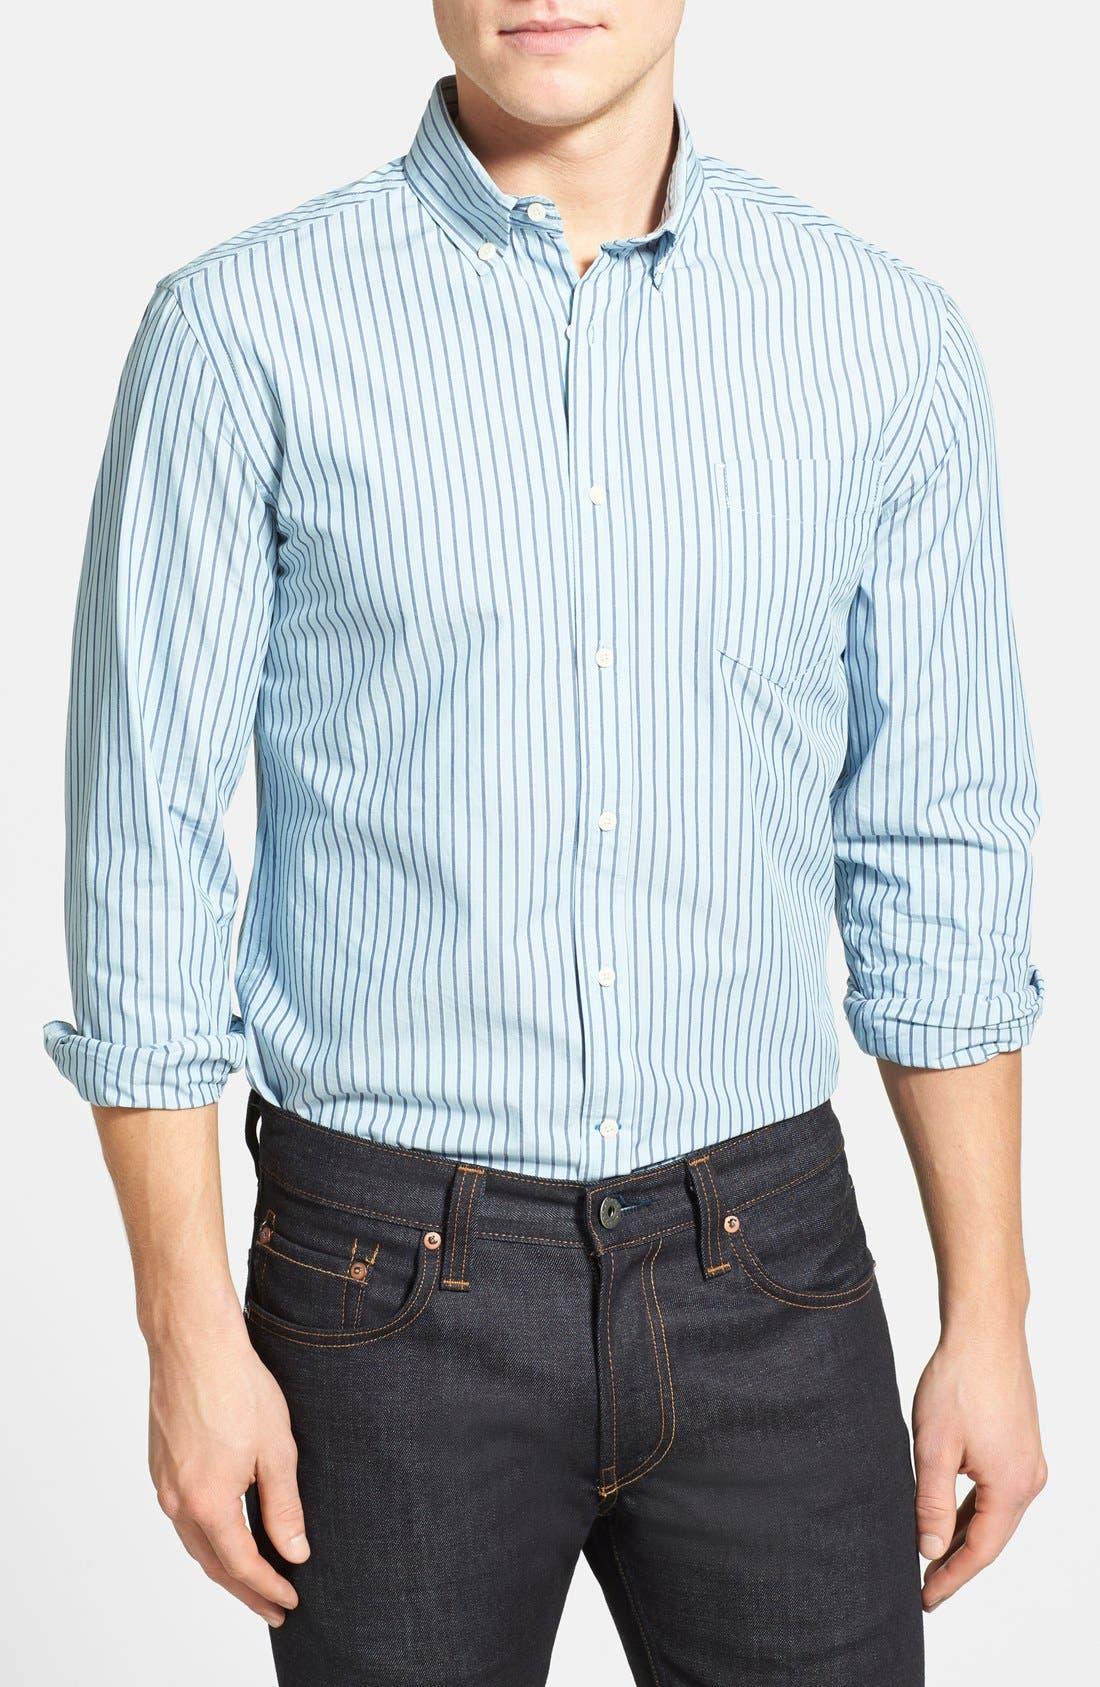 Alternate Image 1 Selected - Haspel Slim Fit Oxford Stripe Button Down Sport Shirt